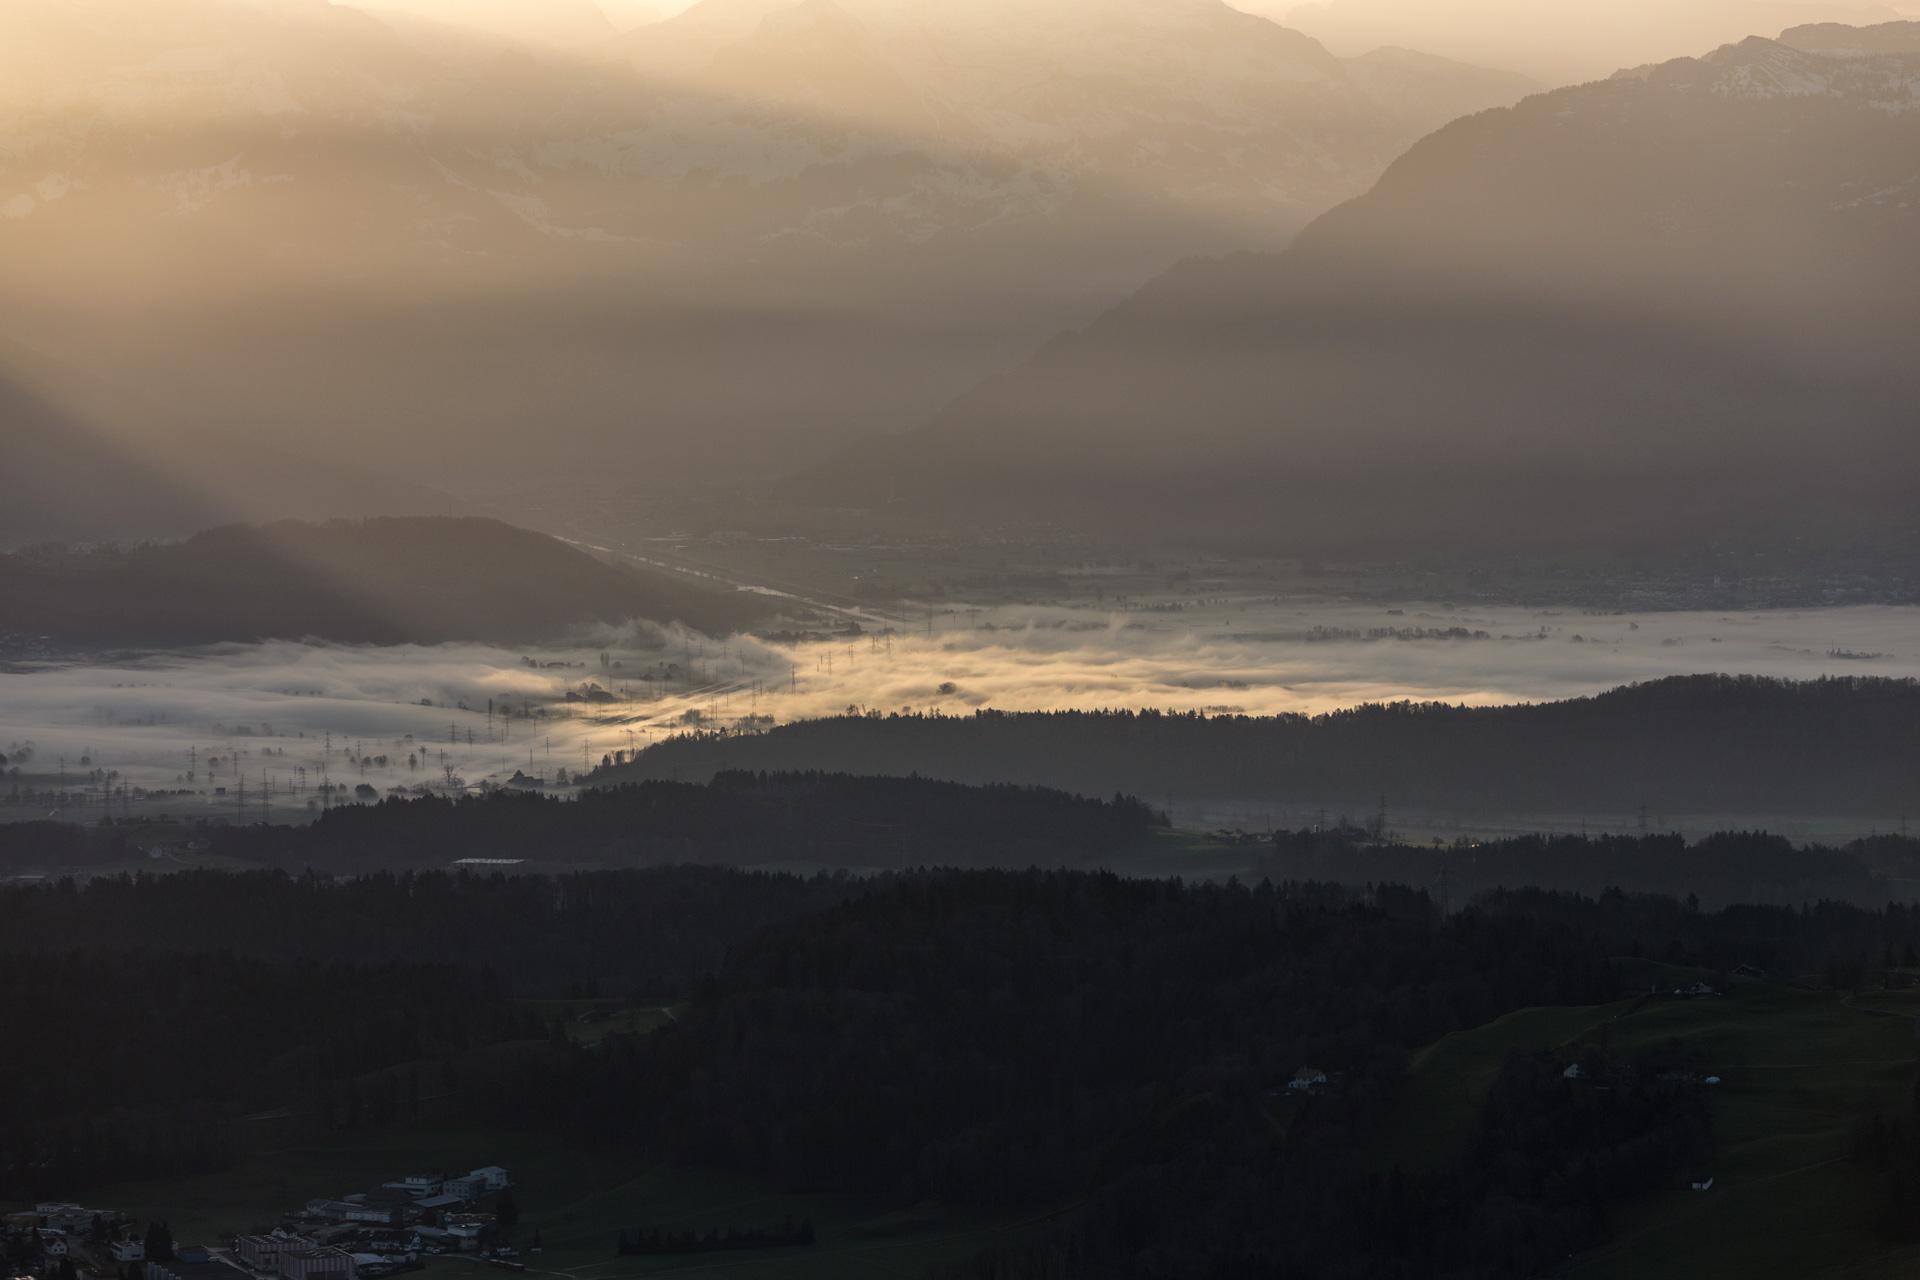 Sonnenaufgang-Bachtelturm_20151219_6003-1